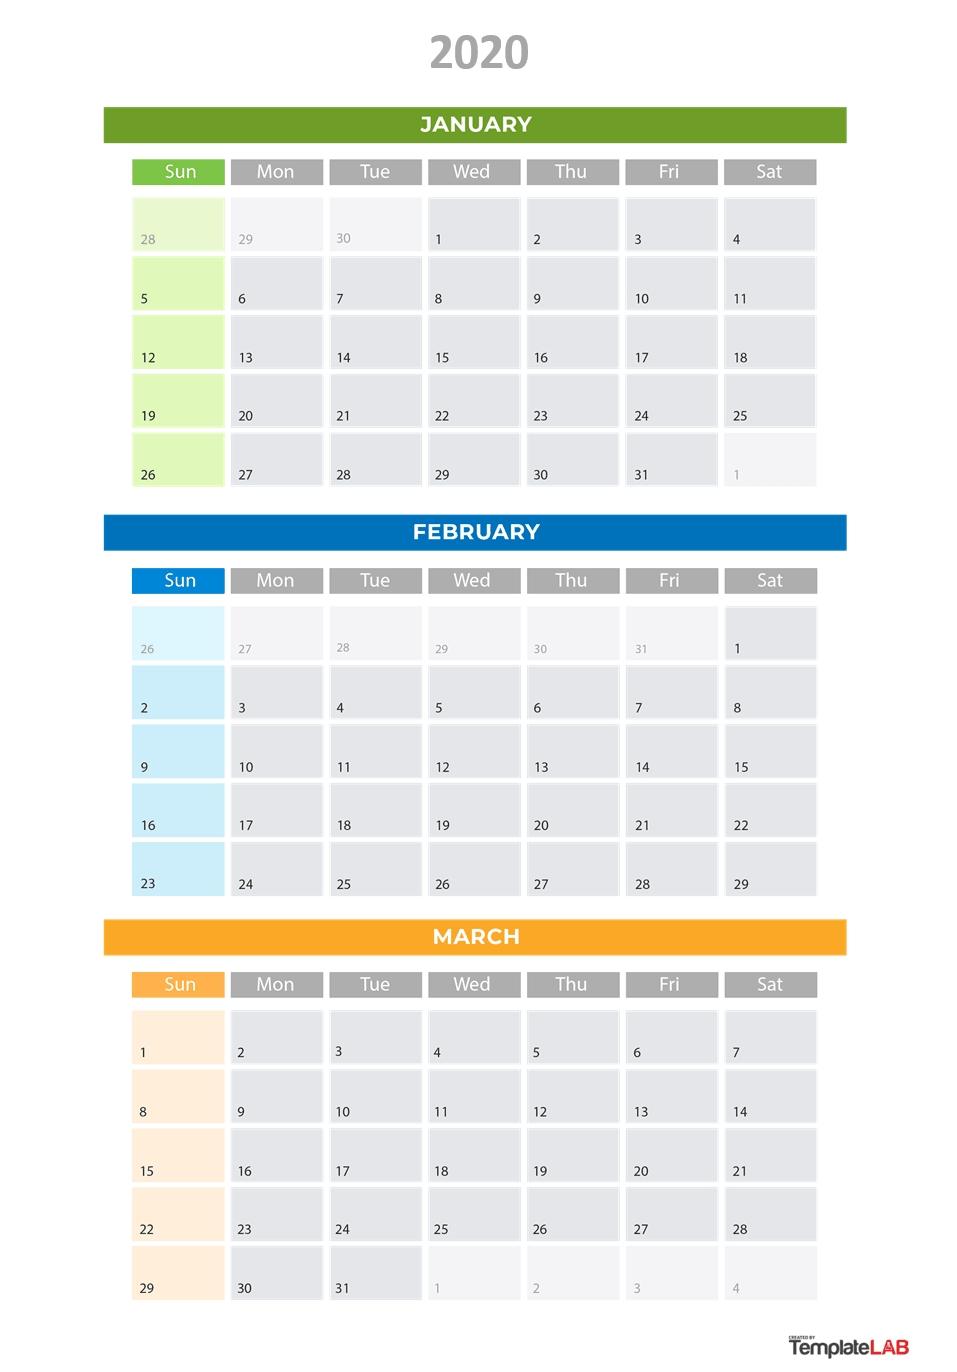 3 Month Calendar Printable 2020 - Wpa.wpart.co-Editable 3 Month Calendar Template 2020